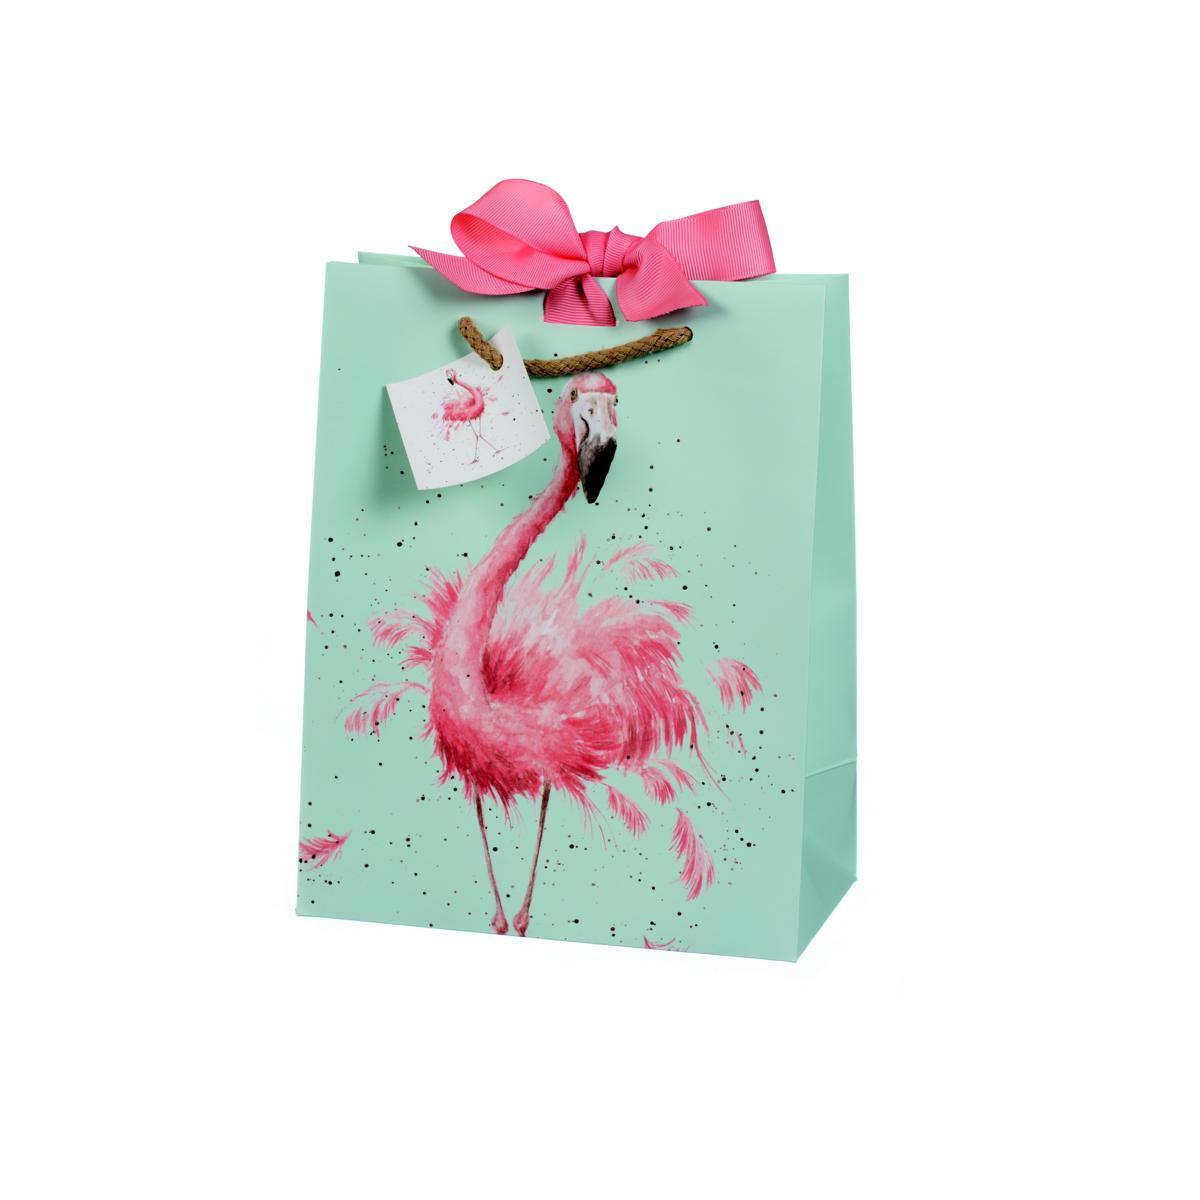 Wrendale Geschenktüte, Motiv Flamingo, mint, 22,5x18 cm